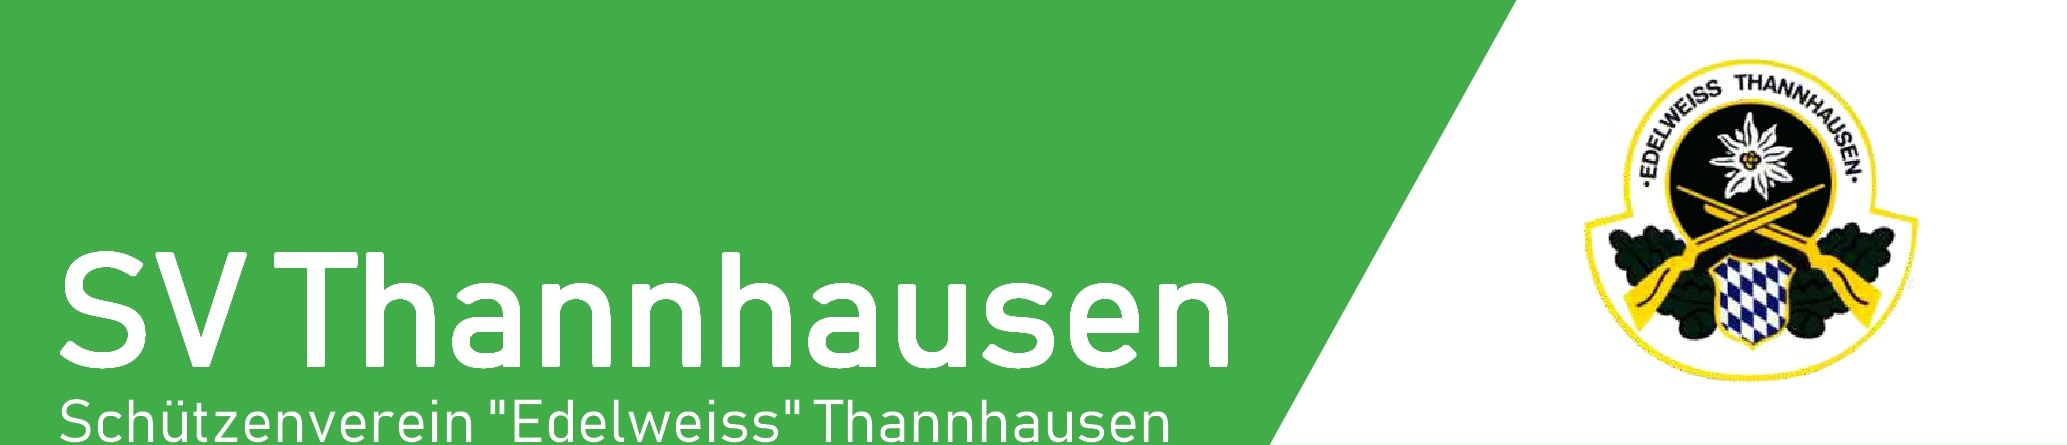 SV Thannhausen